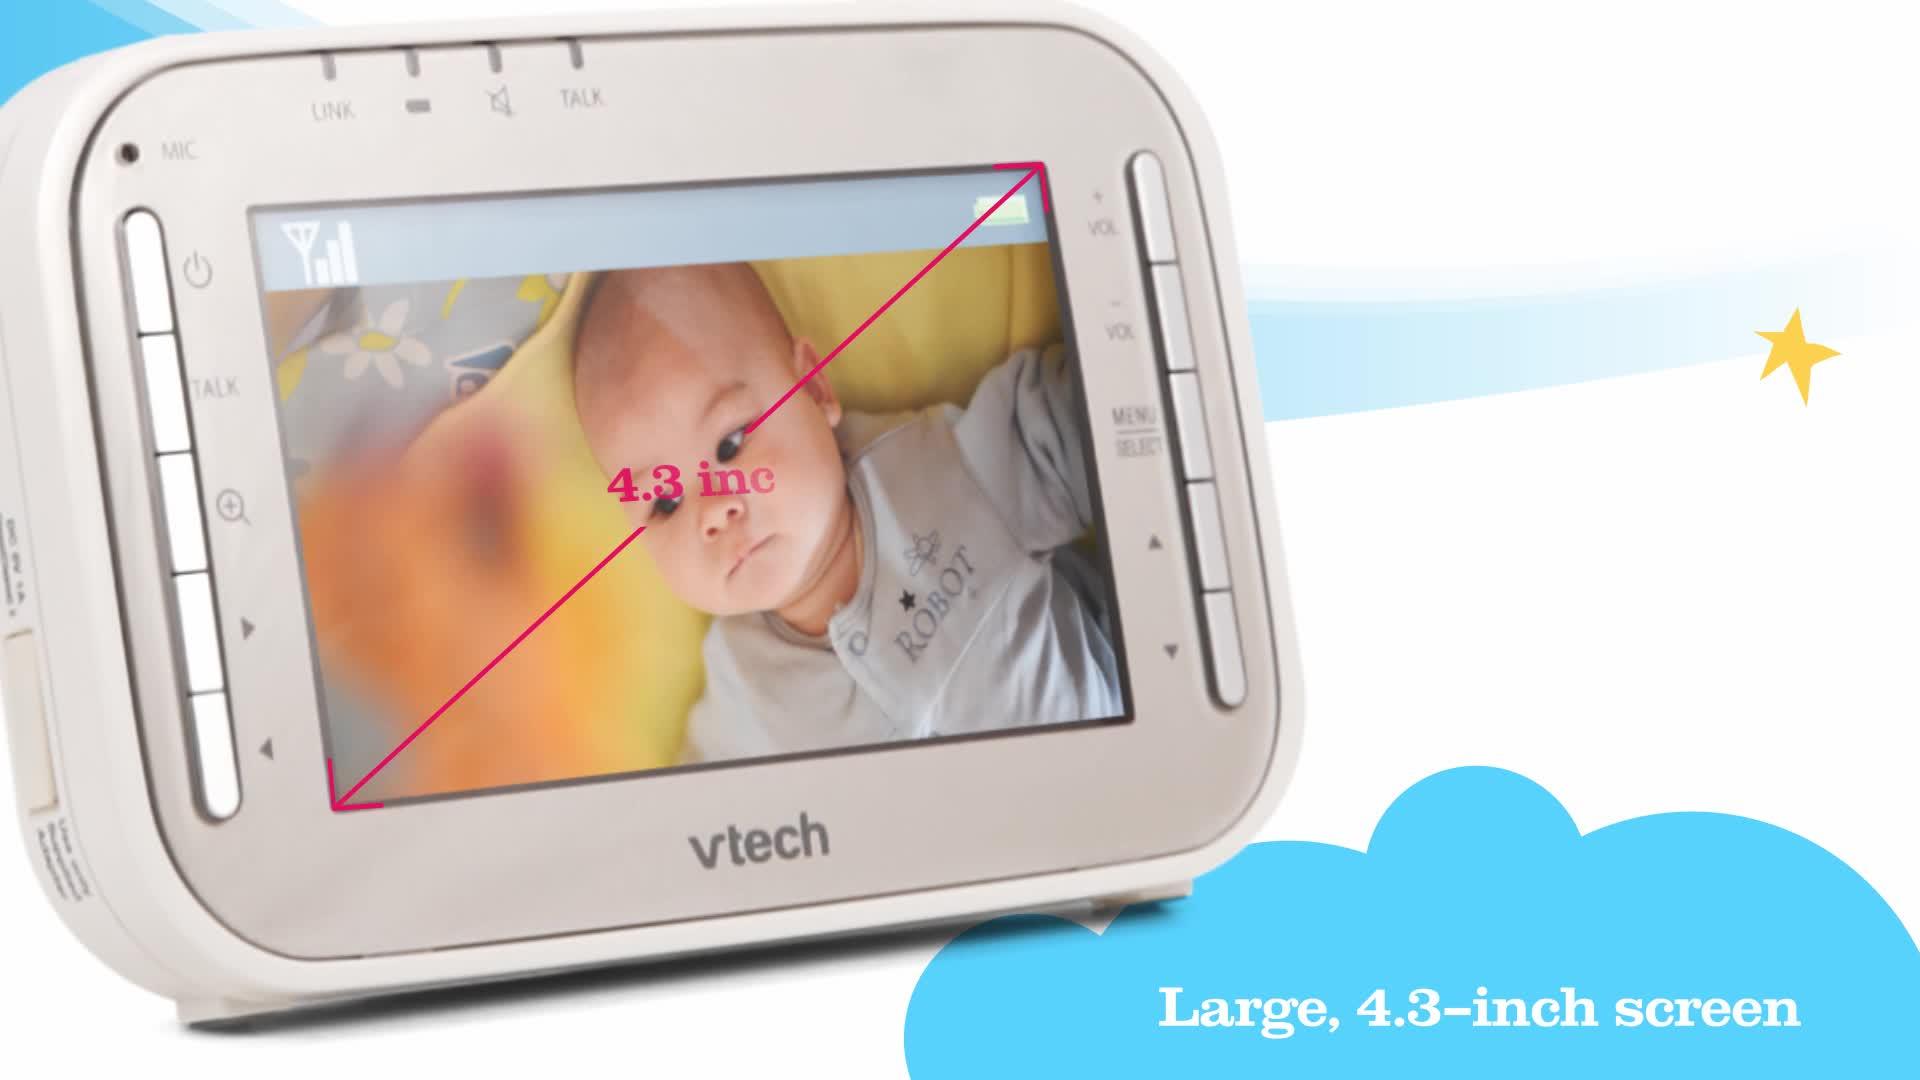 VTech expands award-winning Safe&Sound baby monitor line